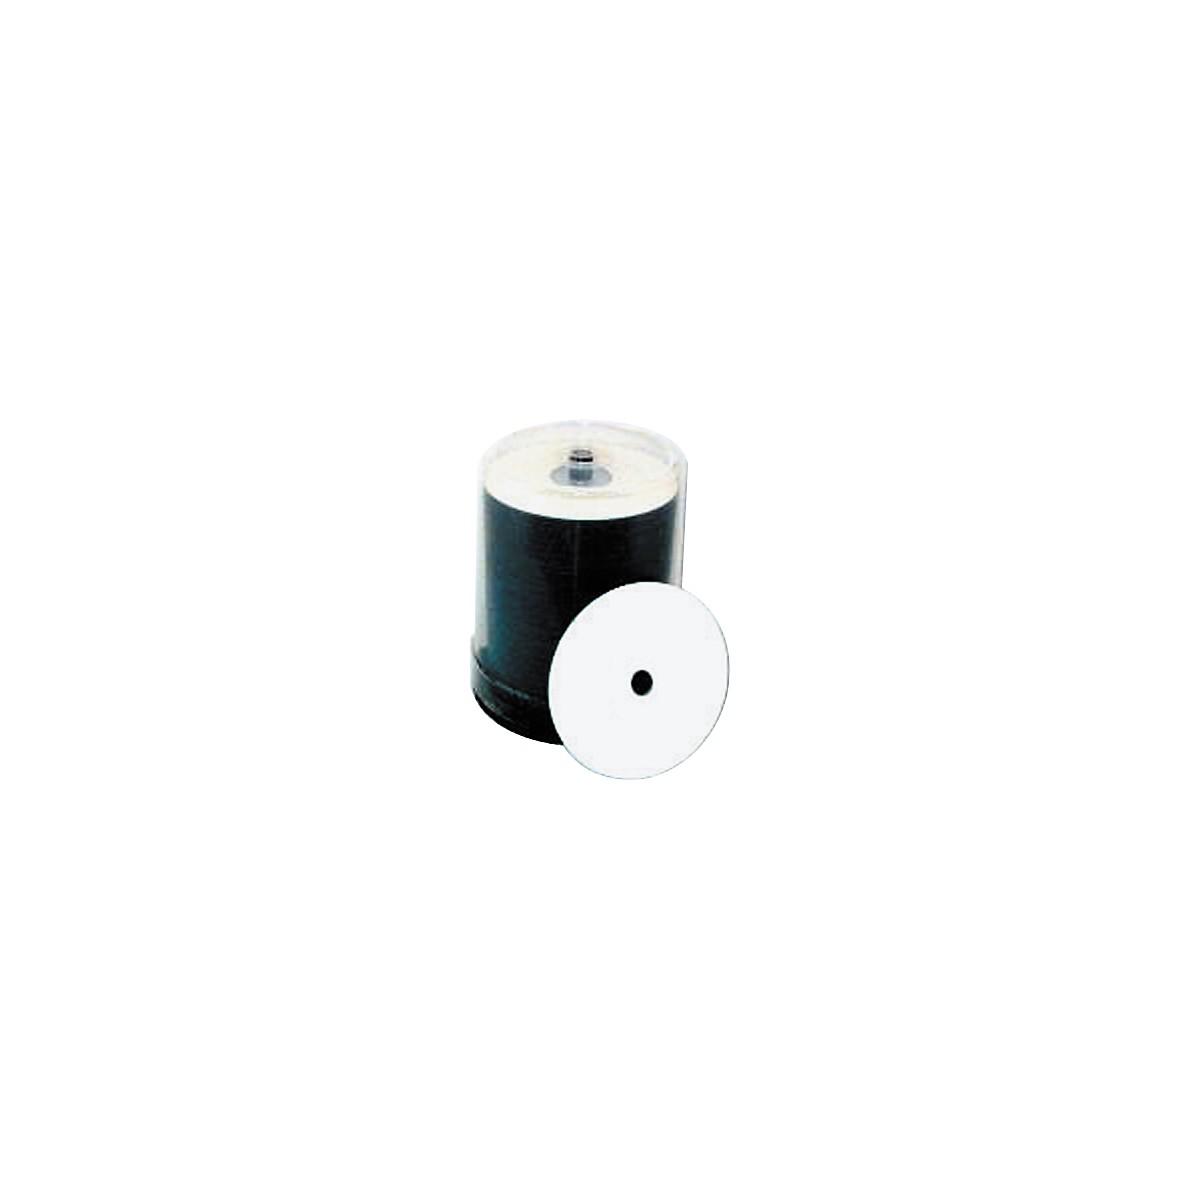 Taiyo Yuden 4.7GB DVD+R, 16X, White Inkjet-Printable and Hub Printable, 100 Disc Spindle